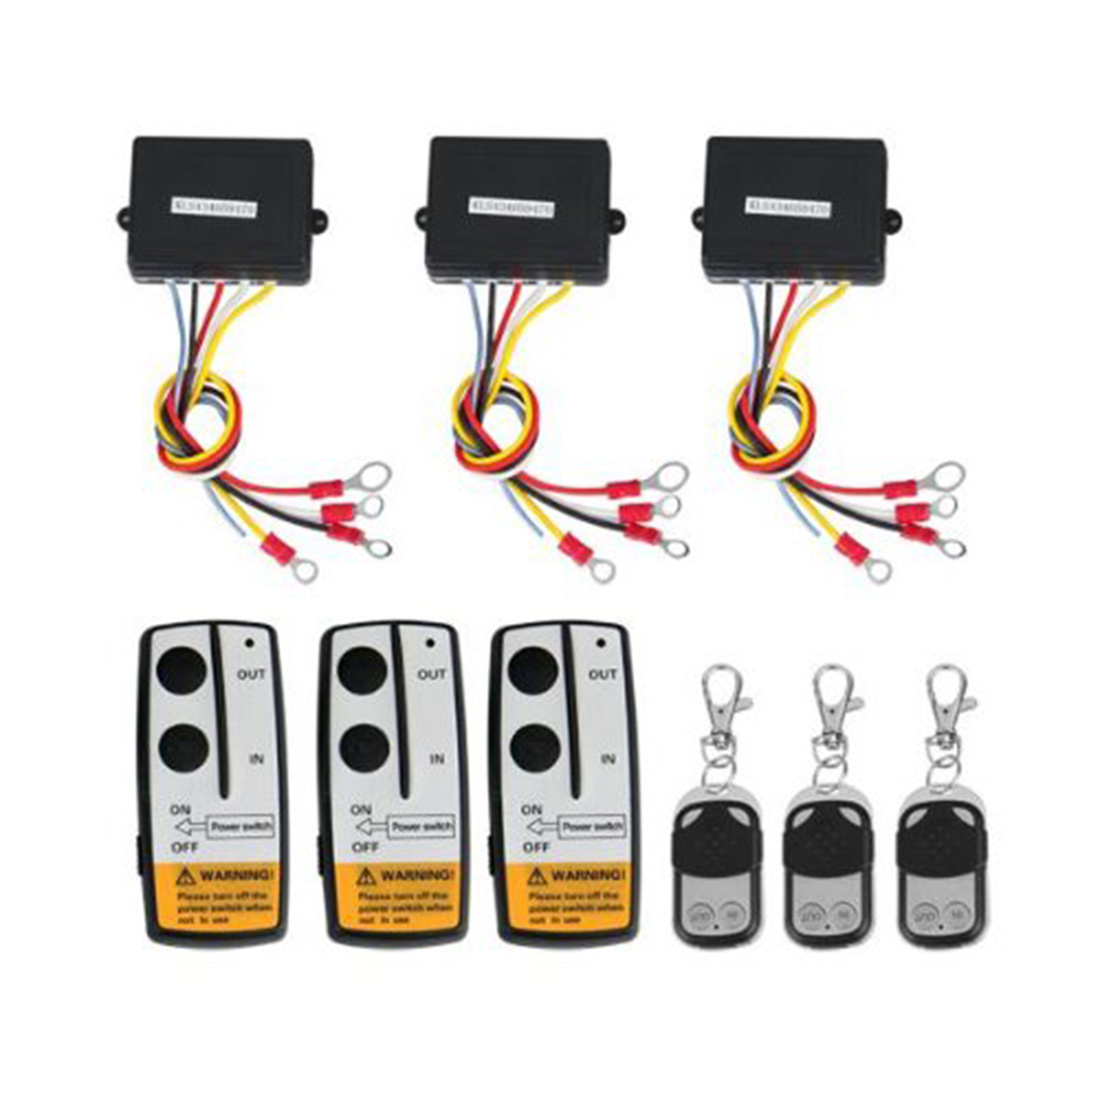 Dewtreetali brand new 3 Wireless Winch Remote Control Set Kit 12V For Truck Jeep SUV ATV